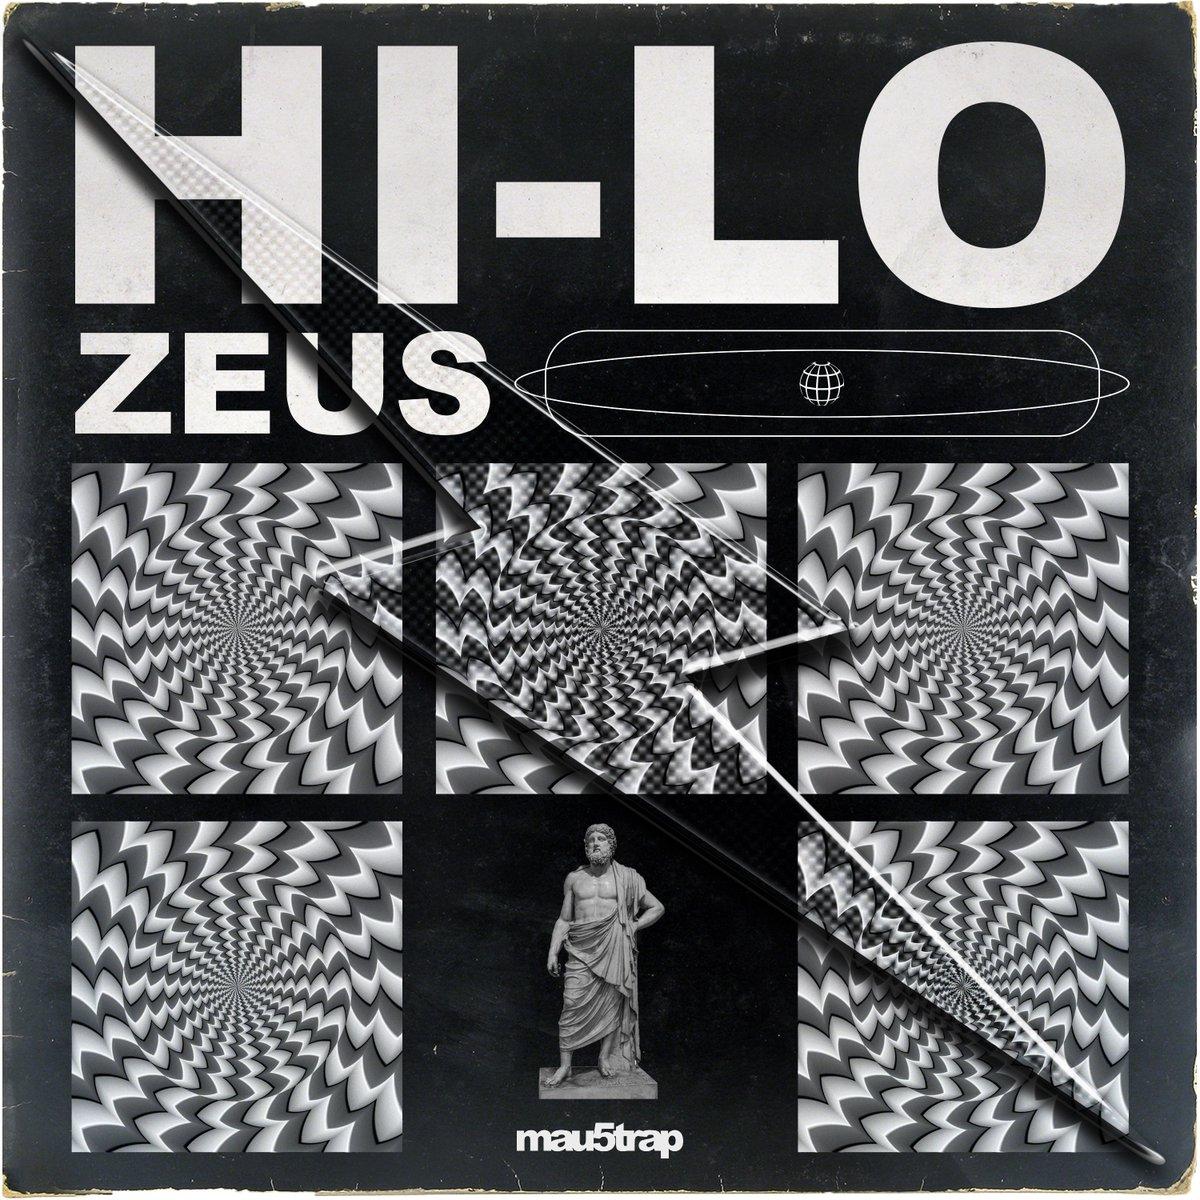 HI-LO - ZEUS ⚡ Out July 3rd on @Mau5trap!! 😎👊 Presave now 👉 mau5trap.ffm.to/zeus